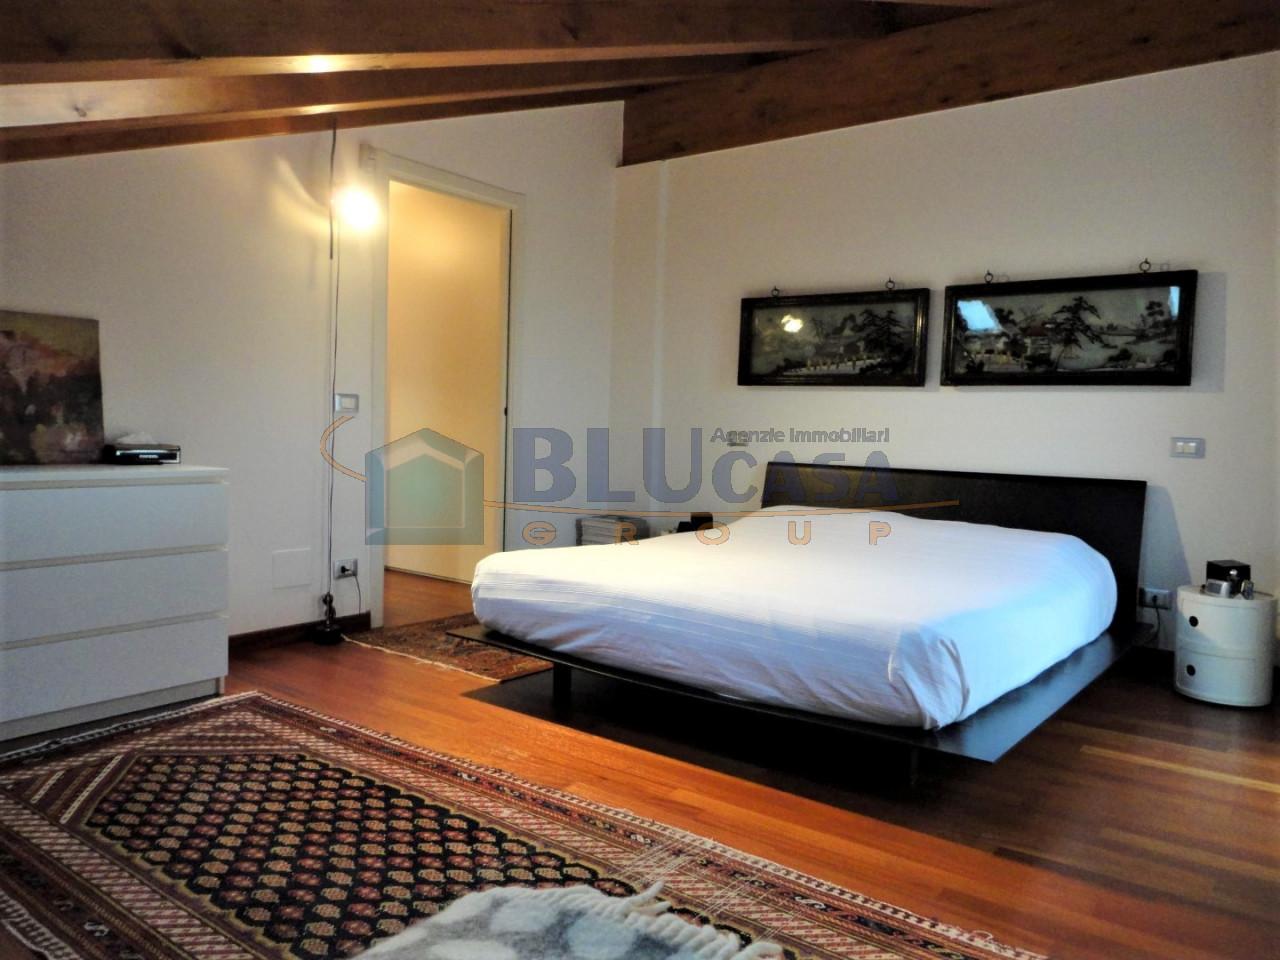 D296 Elegante duplex tricamere con ottime finiture in vendita a Montegrotto Terme https://media.gestionaleimmobiliare.it/foto/annunci/200215/2167876/1280x1280/023__23_camera_matrimoniale__large.jpg